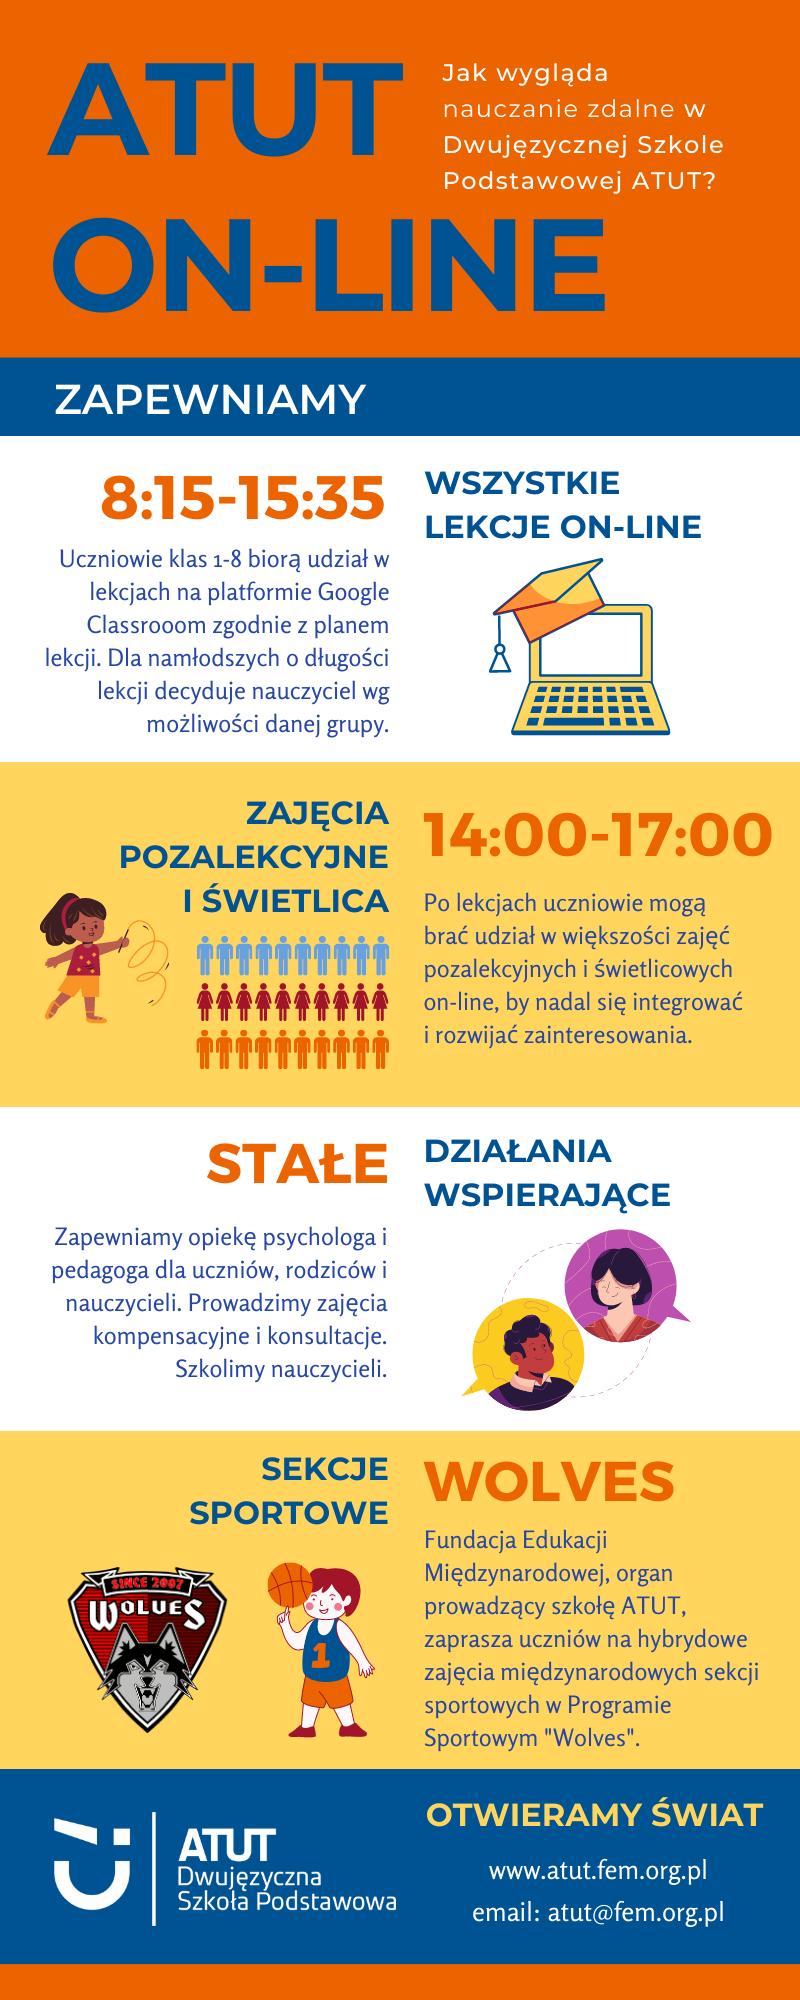 infografika ATUT nauczanie on-line